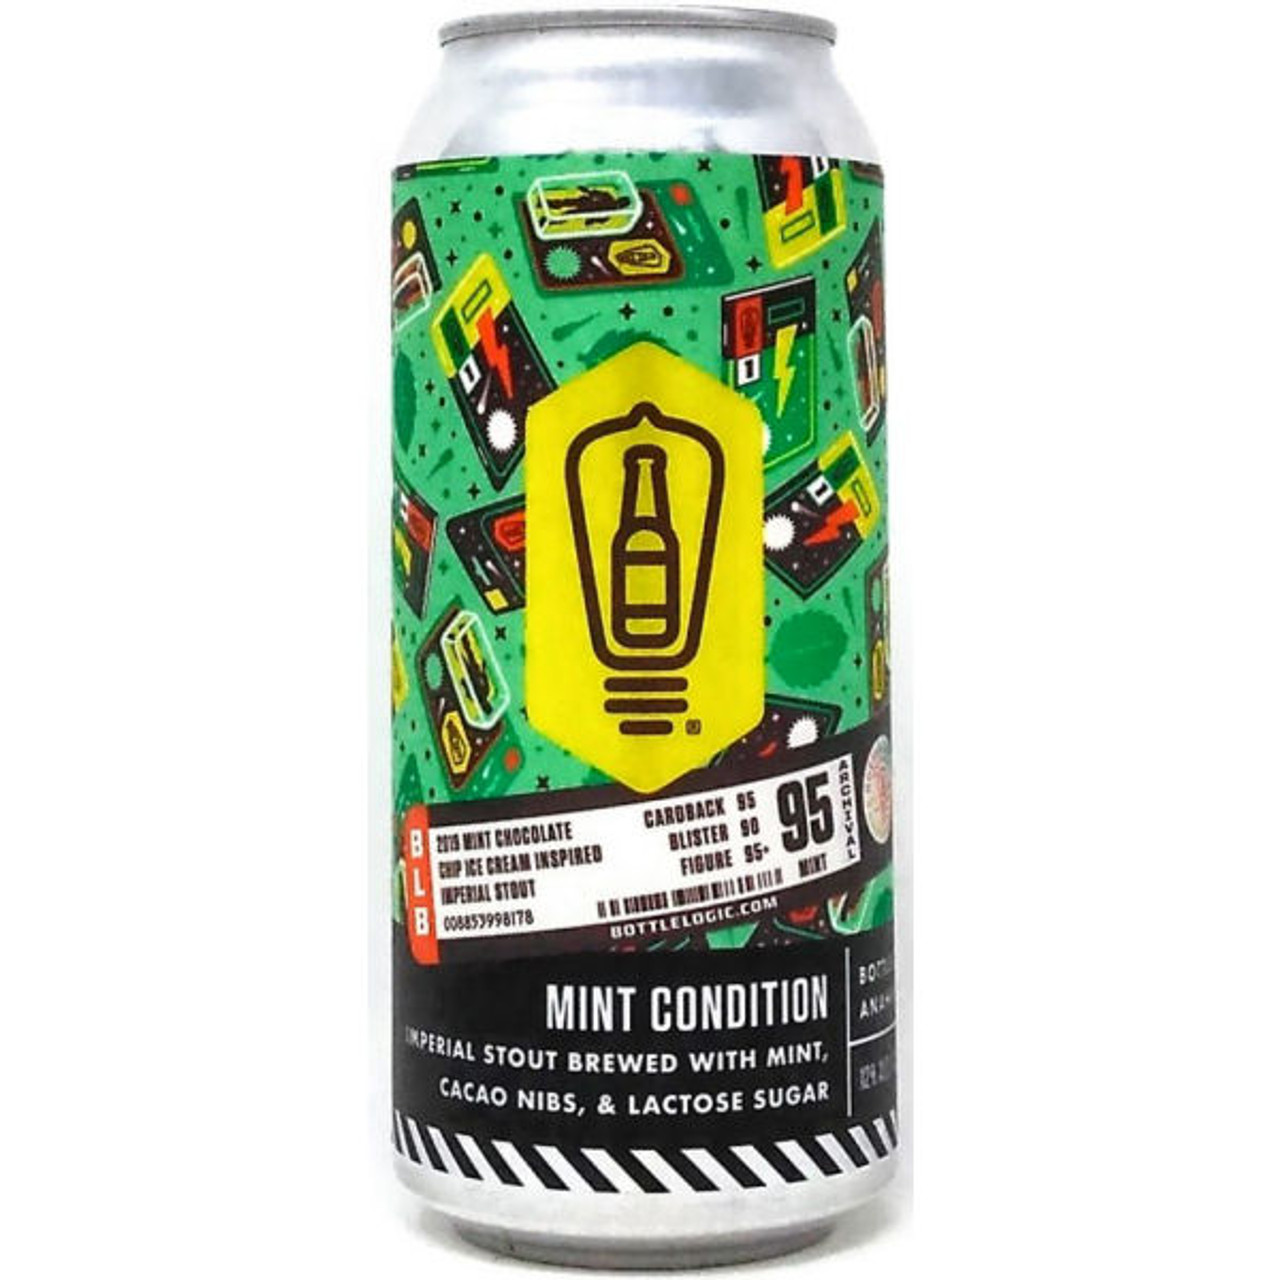 Bottle Logic Mint Condition Imperial Stout 16oz Can